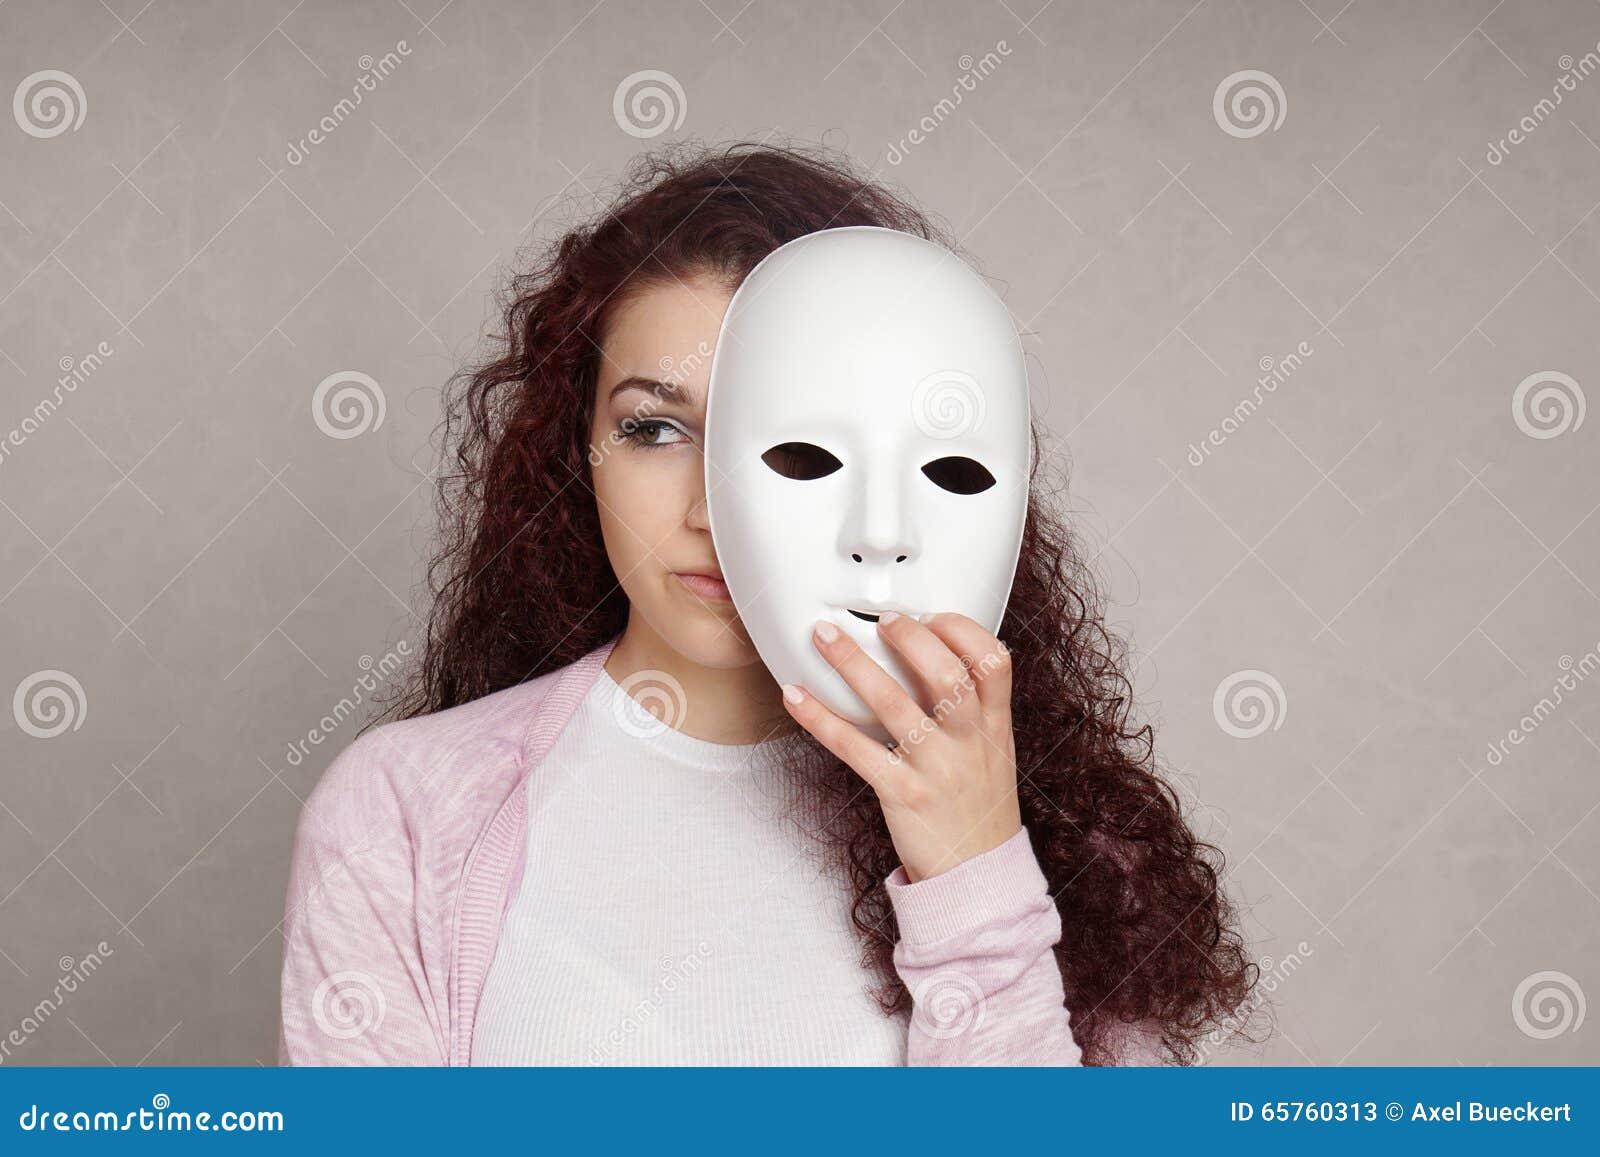 Sad Girl Hiding Behind Mask Stock Image Image 65760313